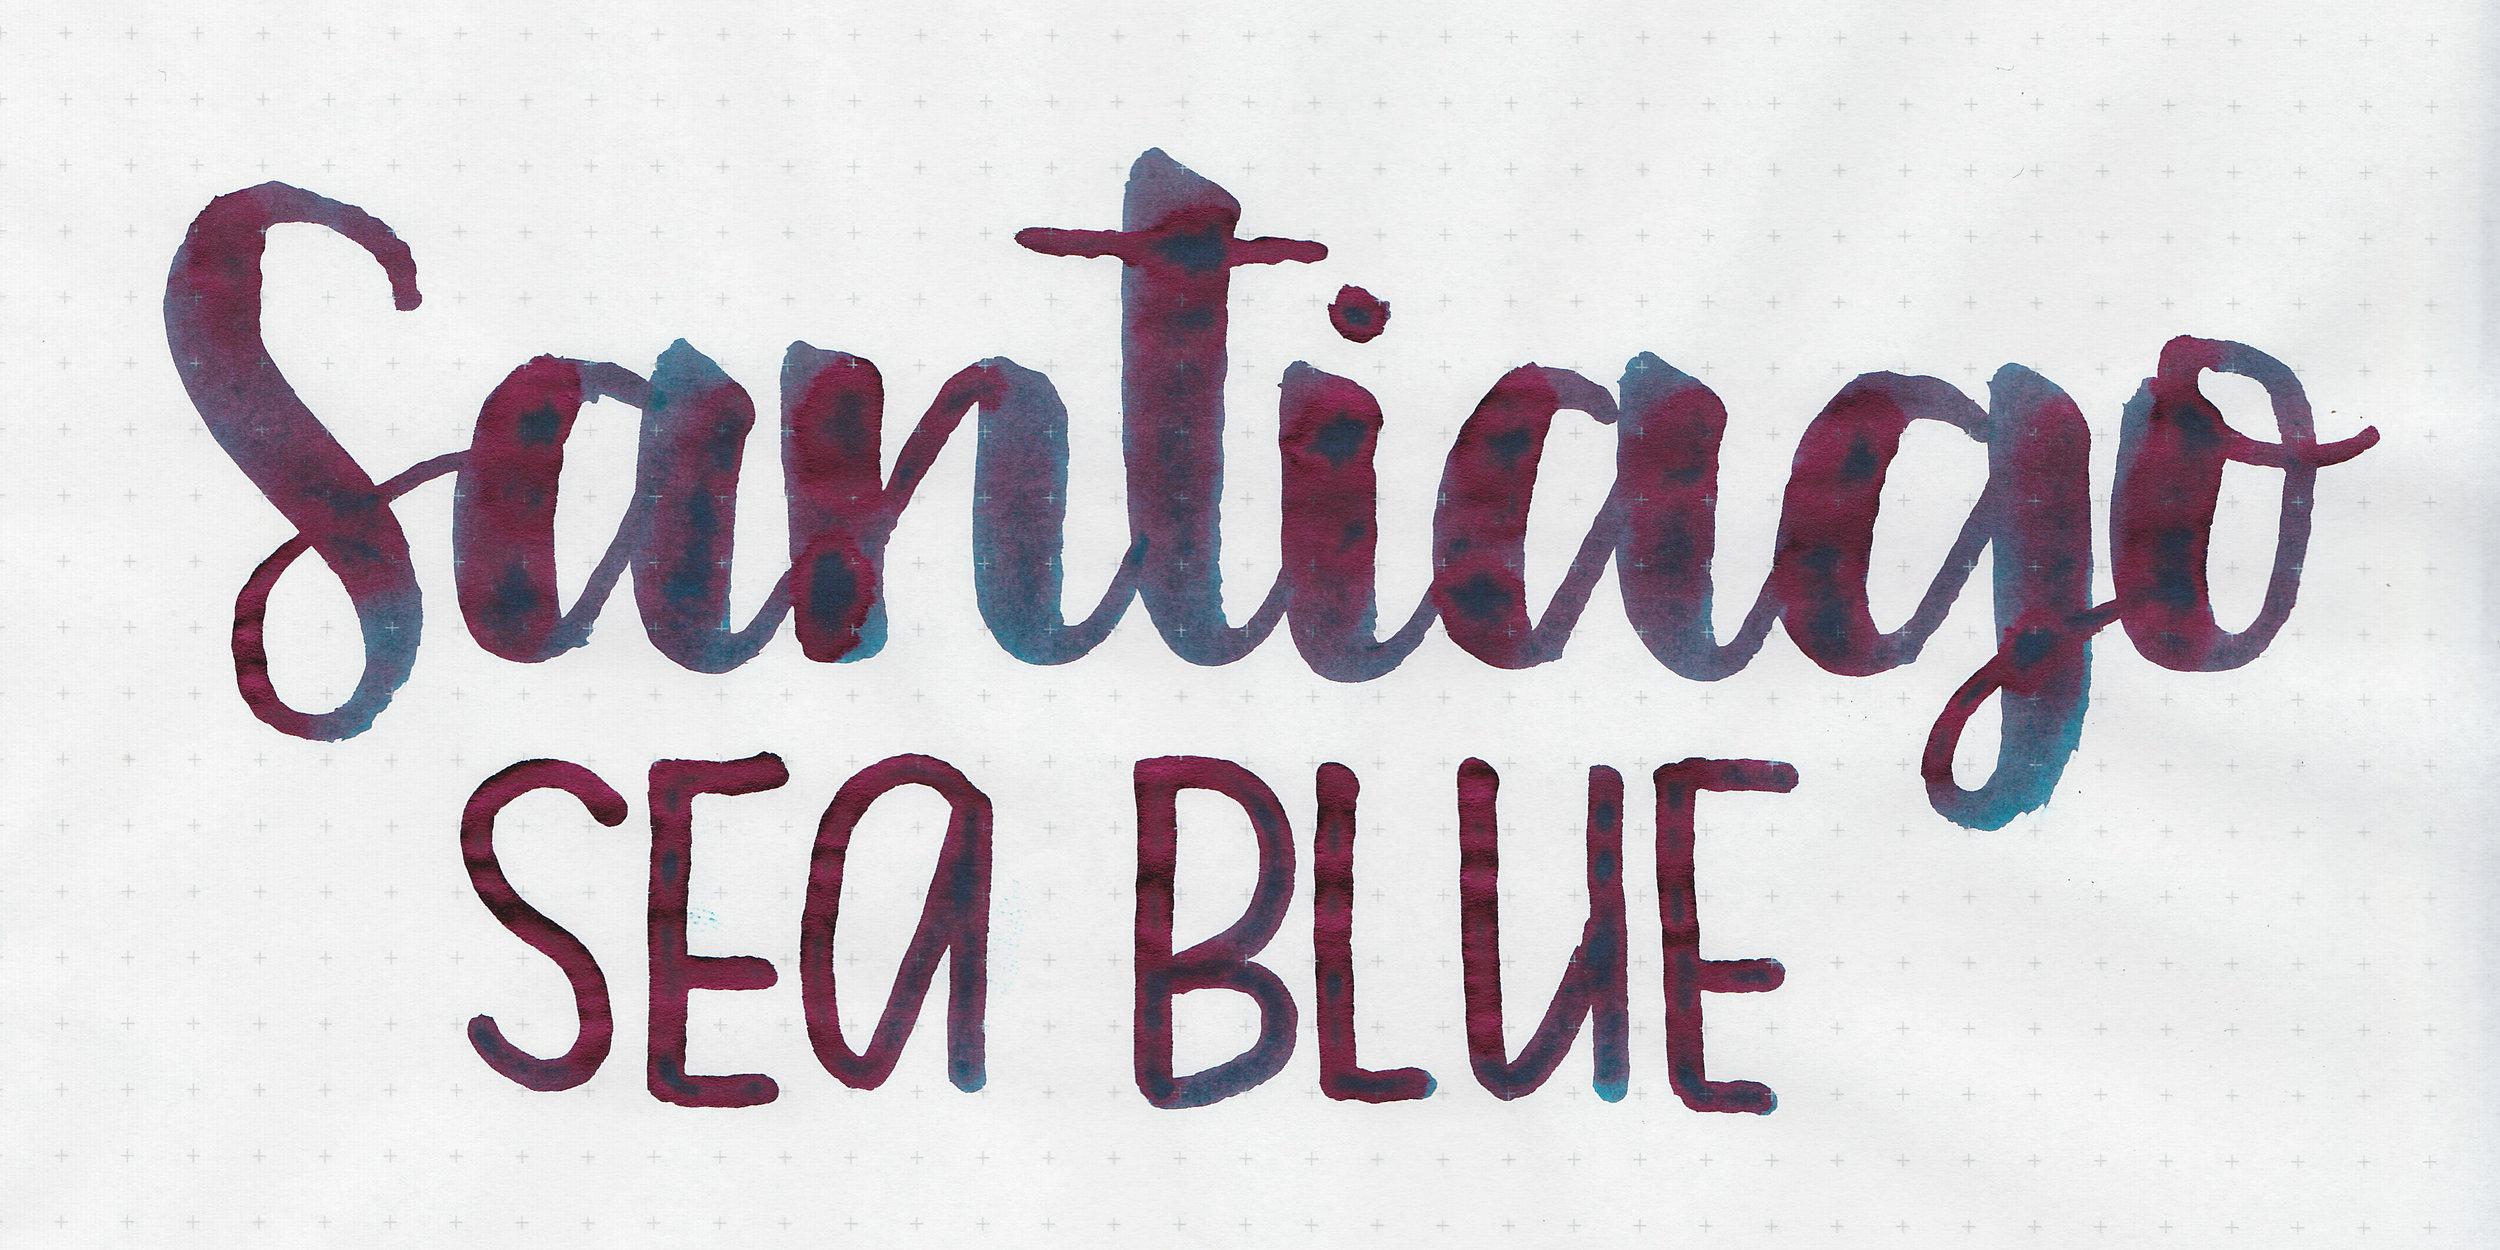 os-santiago-sea-blue-3.jpg